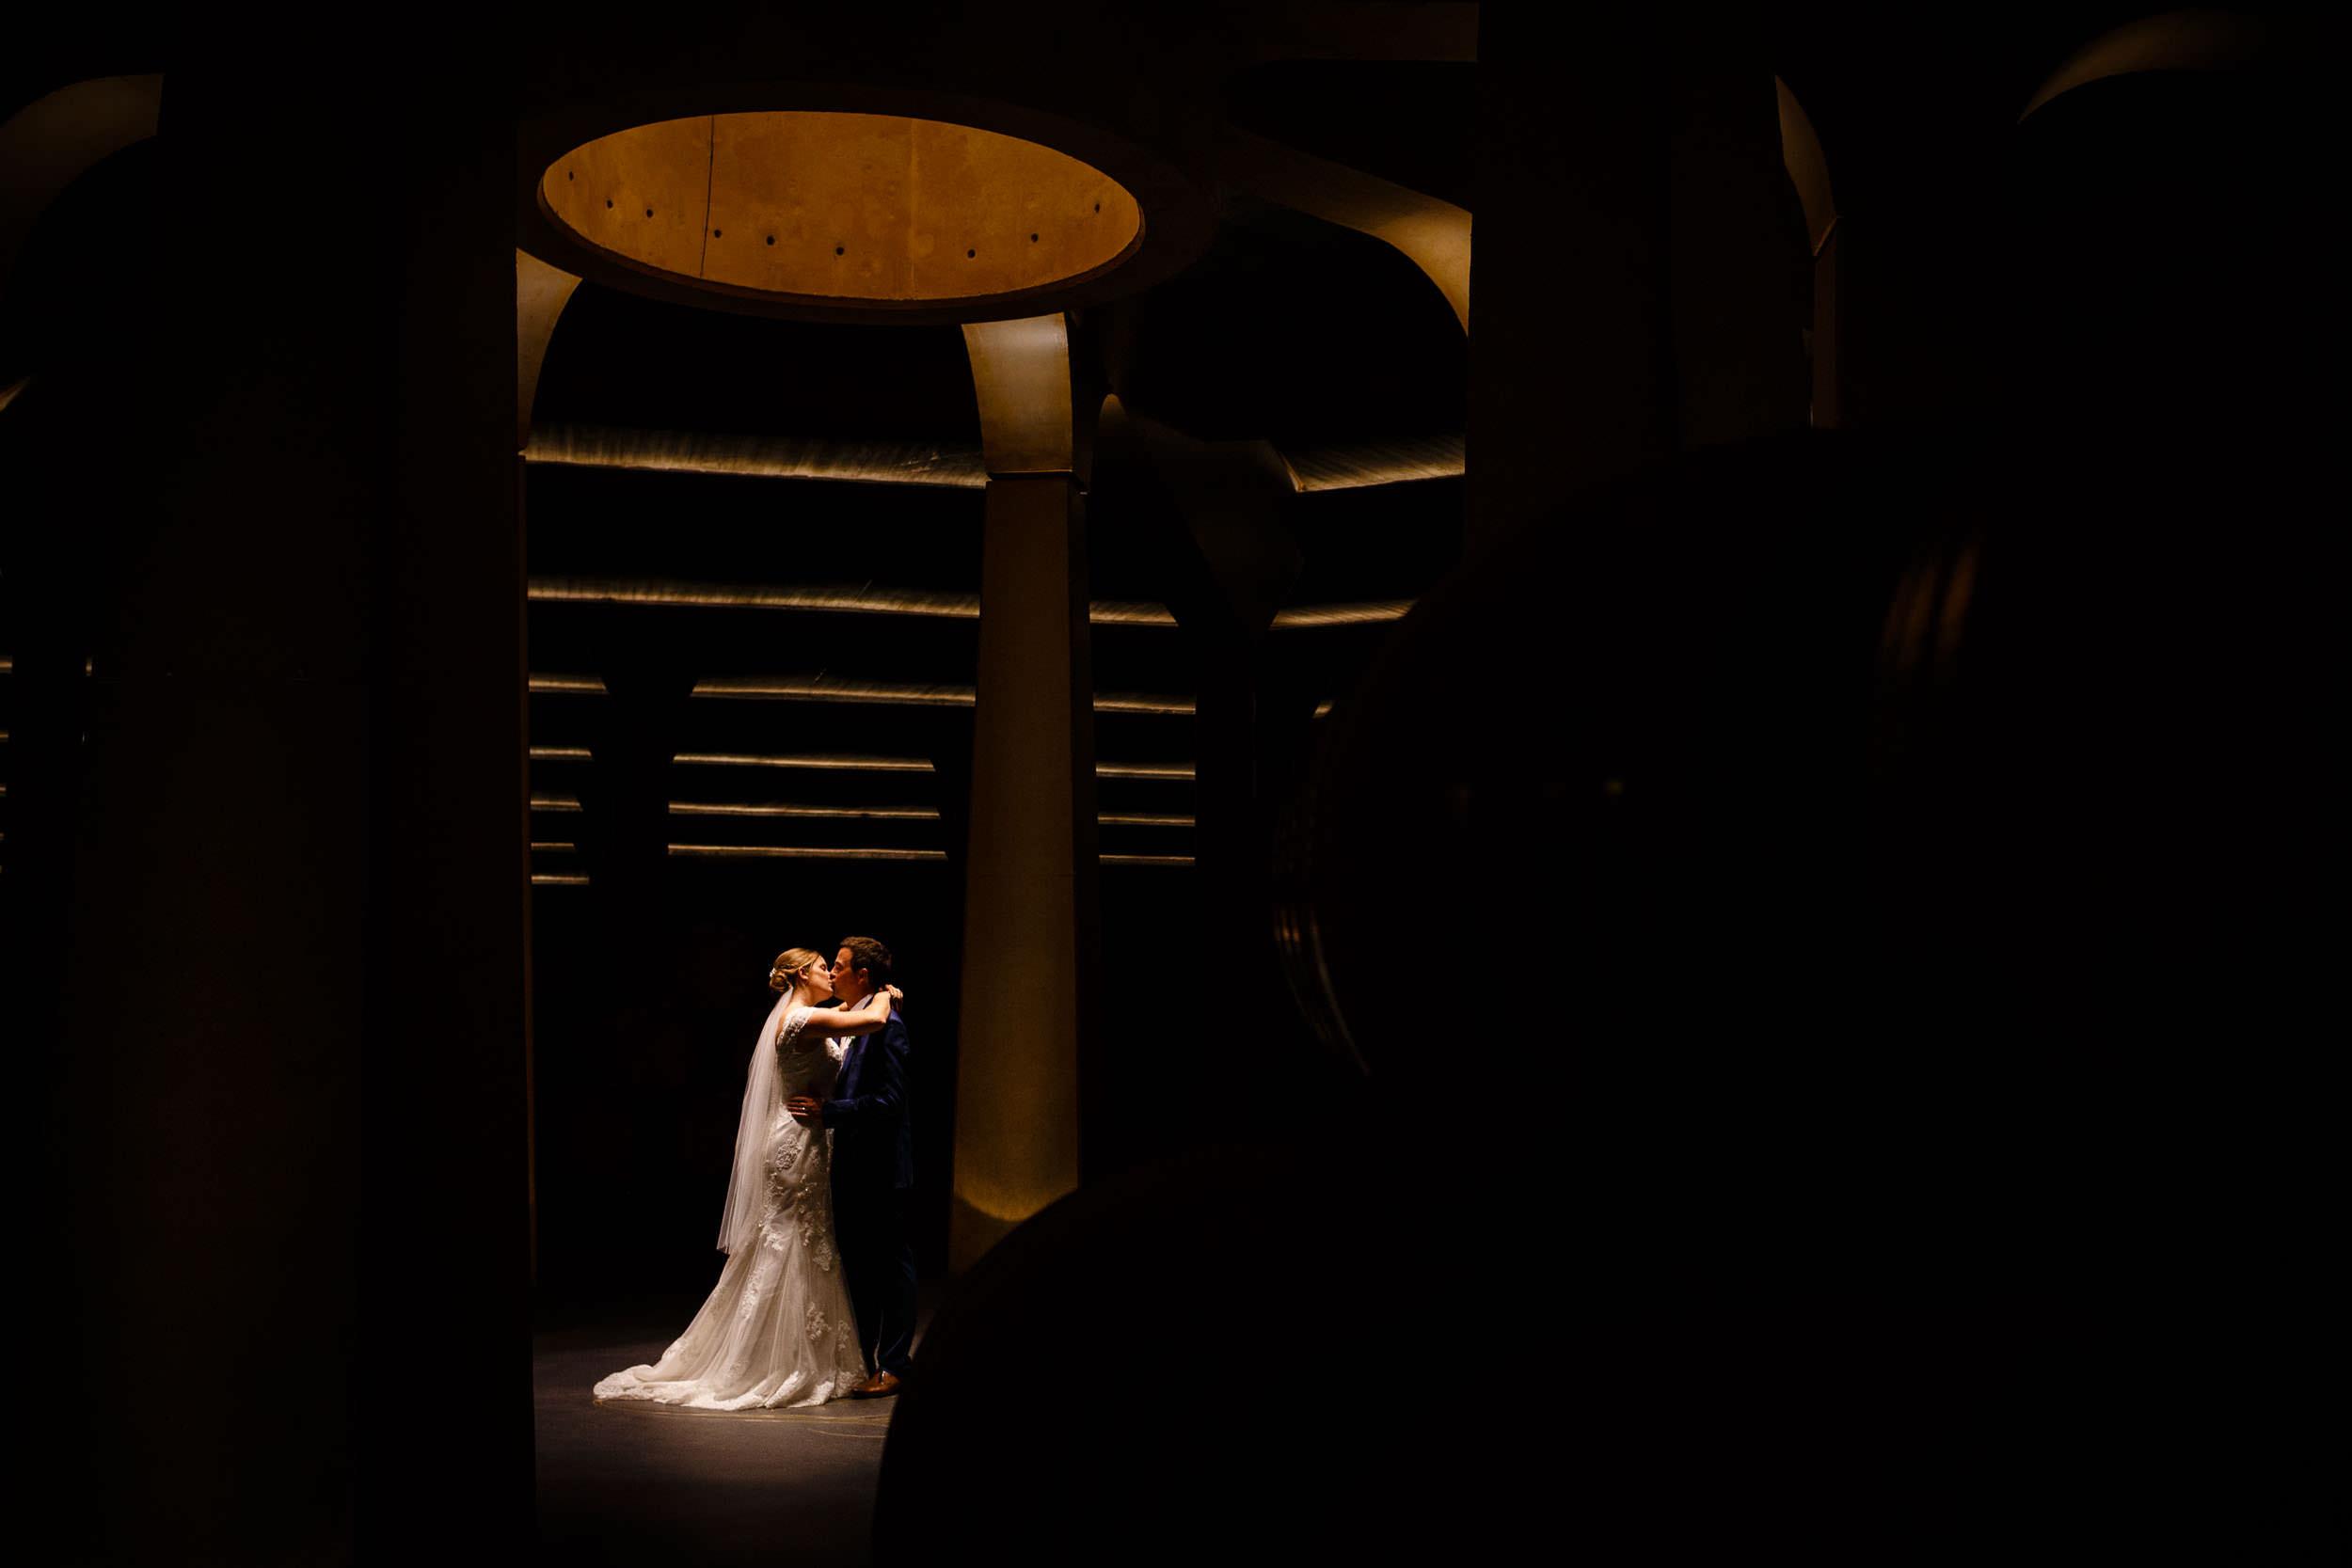 27/8/16 Amy & Carl's wedding at Bodegas Vivanco, Briones, La Rioja, Spain. Photo by James Sturcke | www.sturcke.org